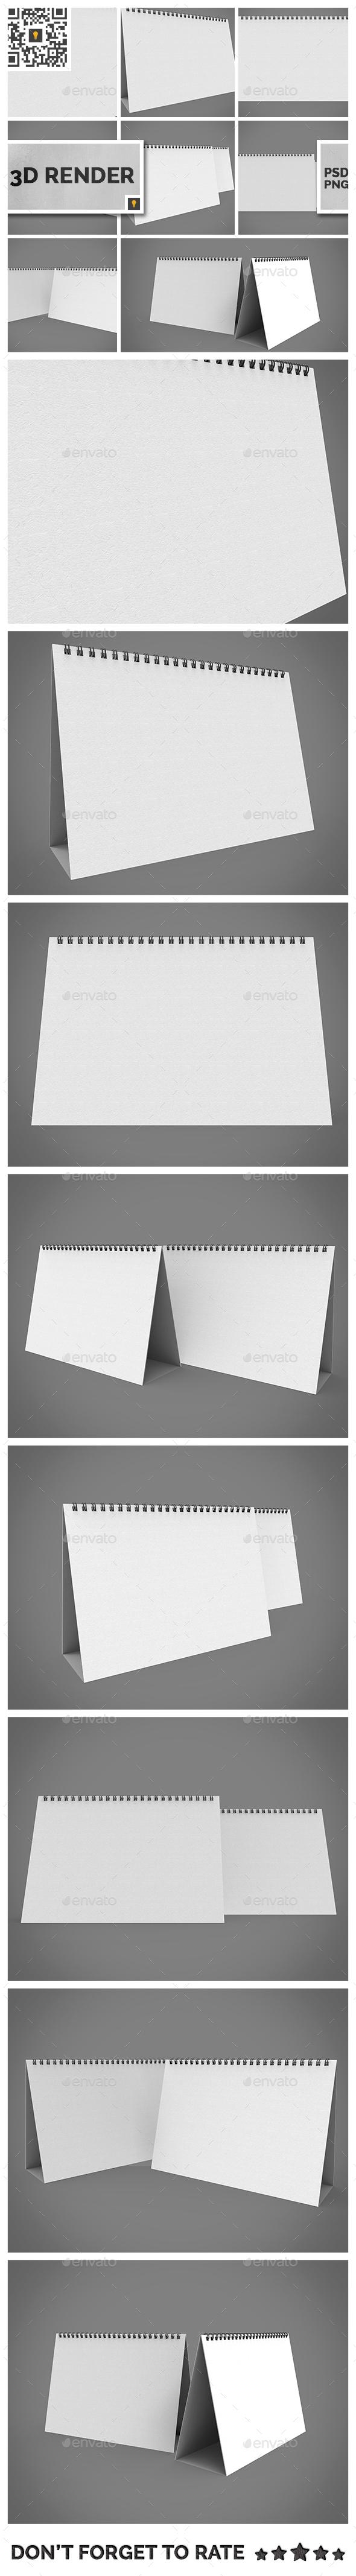 Desktop Calendar 3D Render - Objects 3D Renders